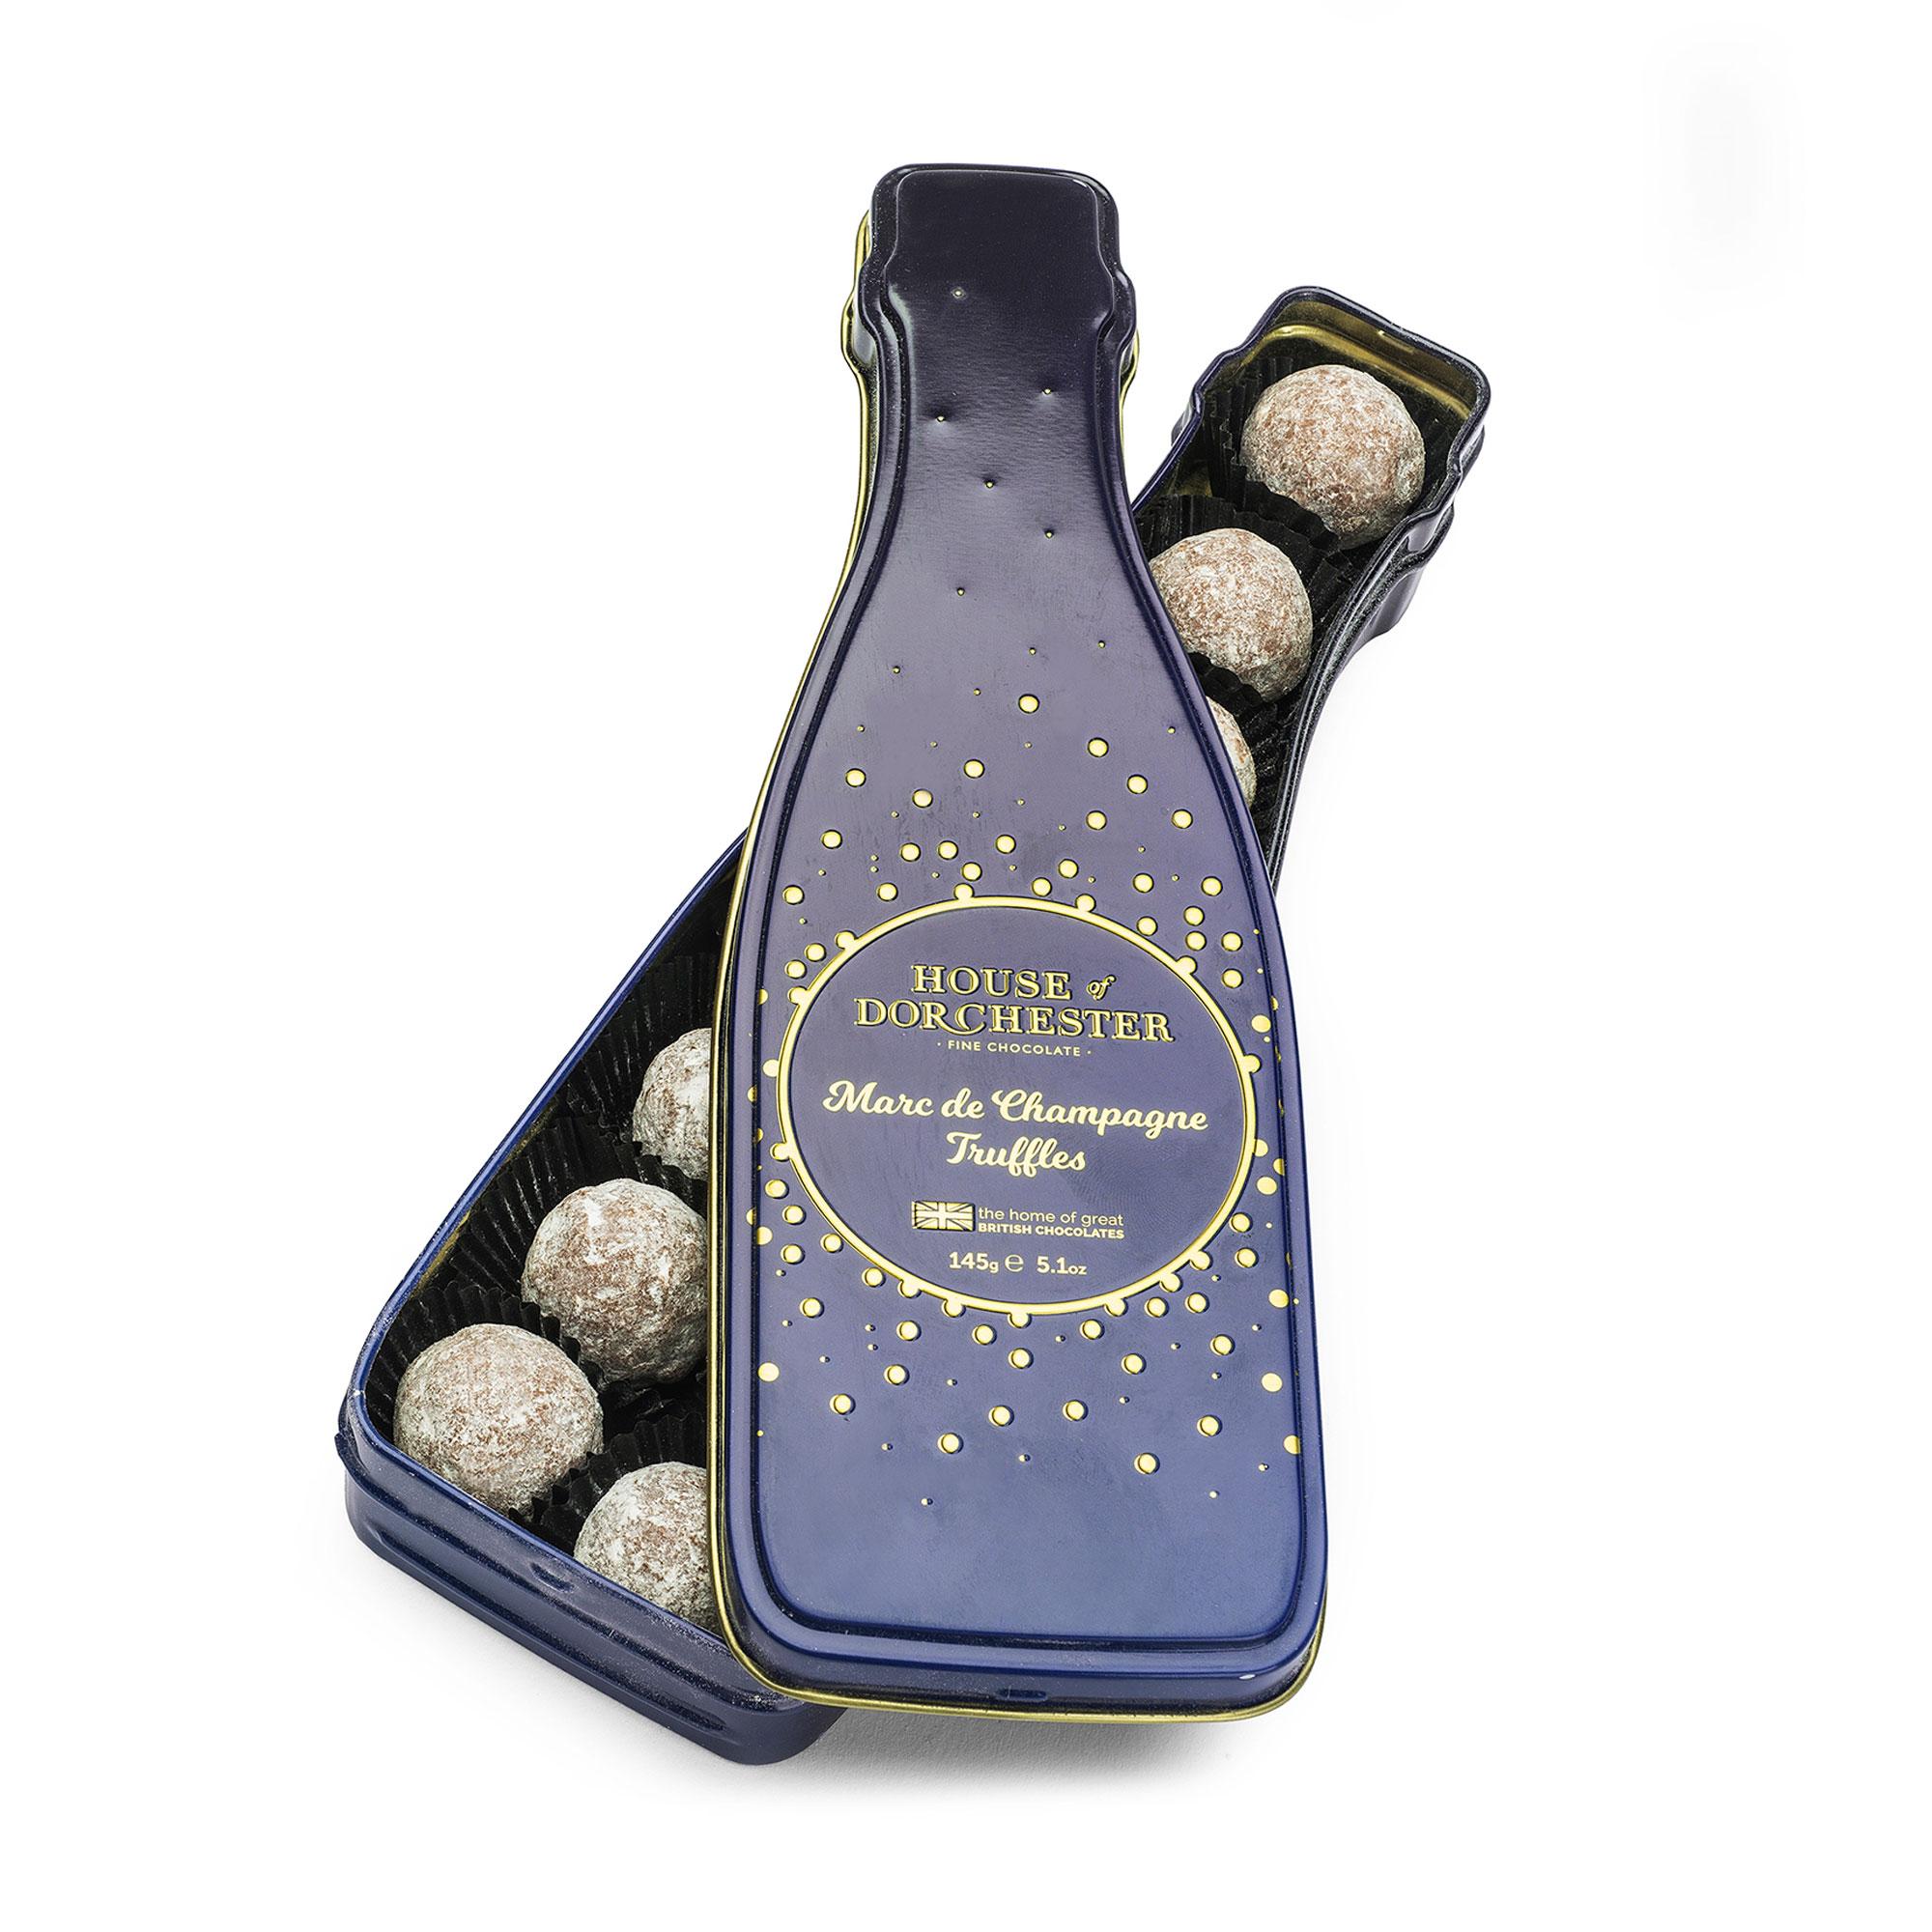 Marc de Champagne Truffles tin